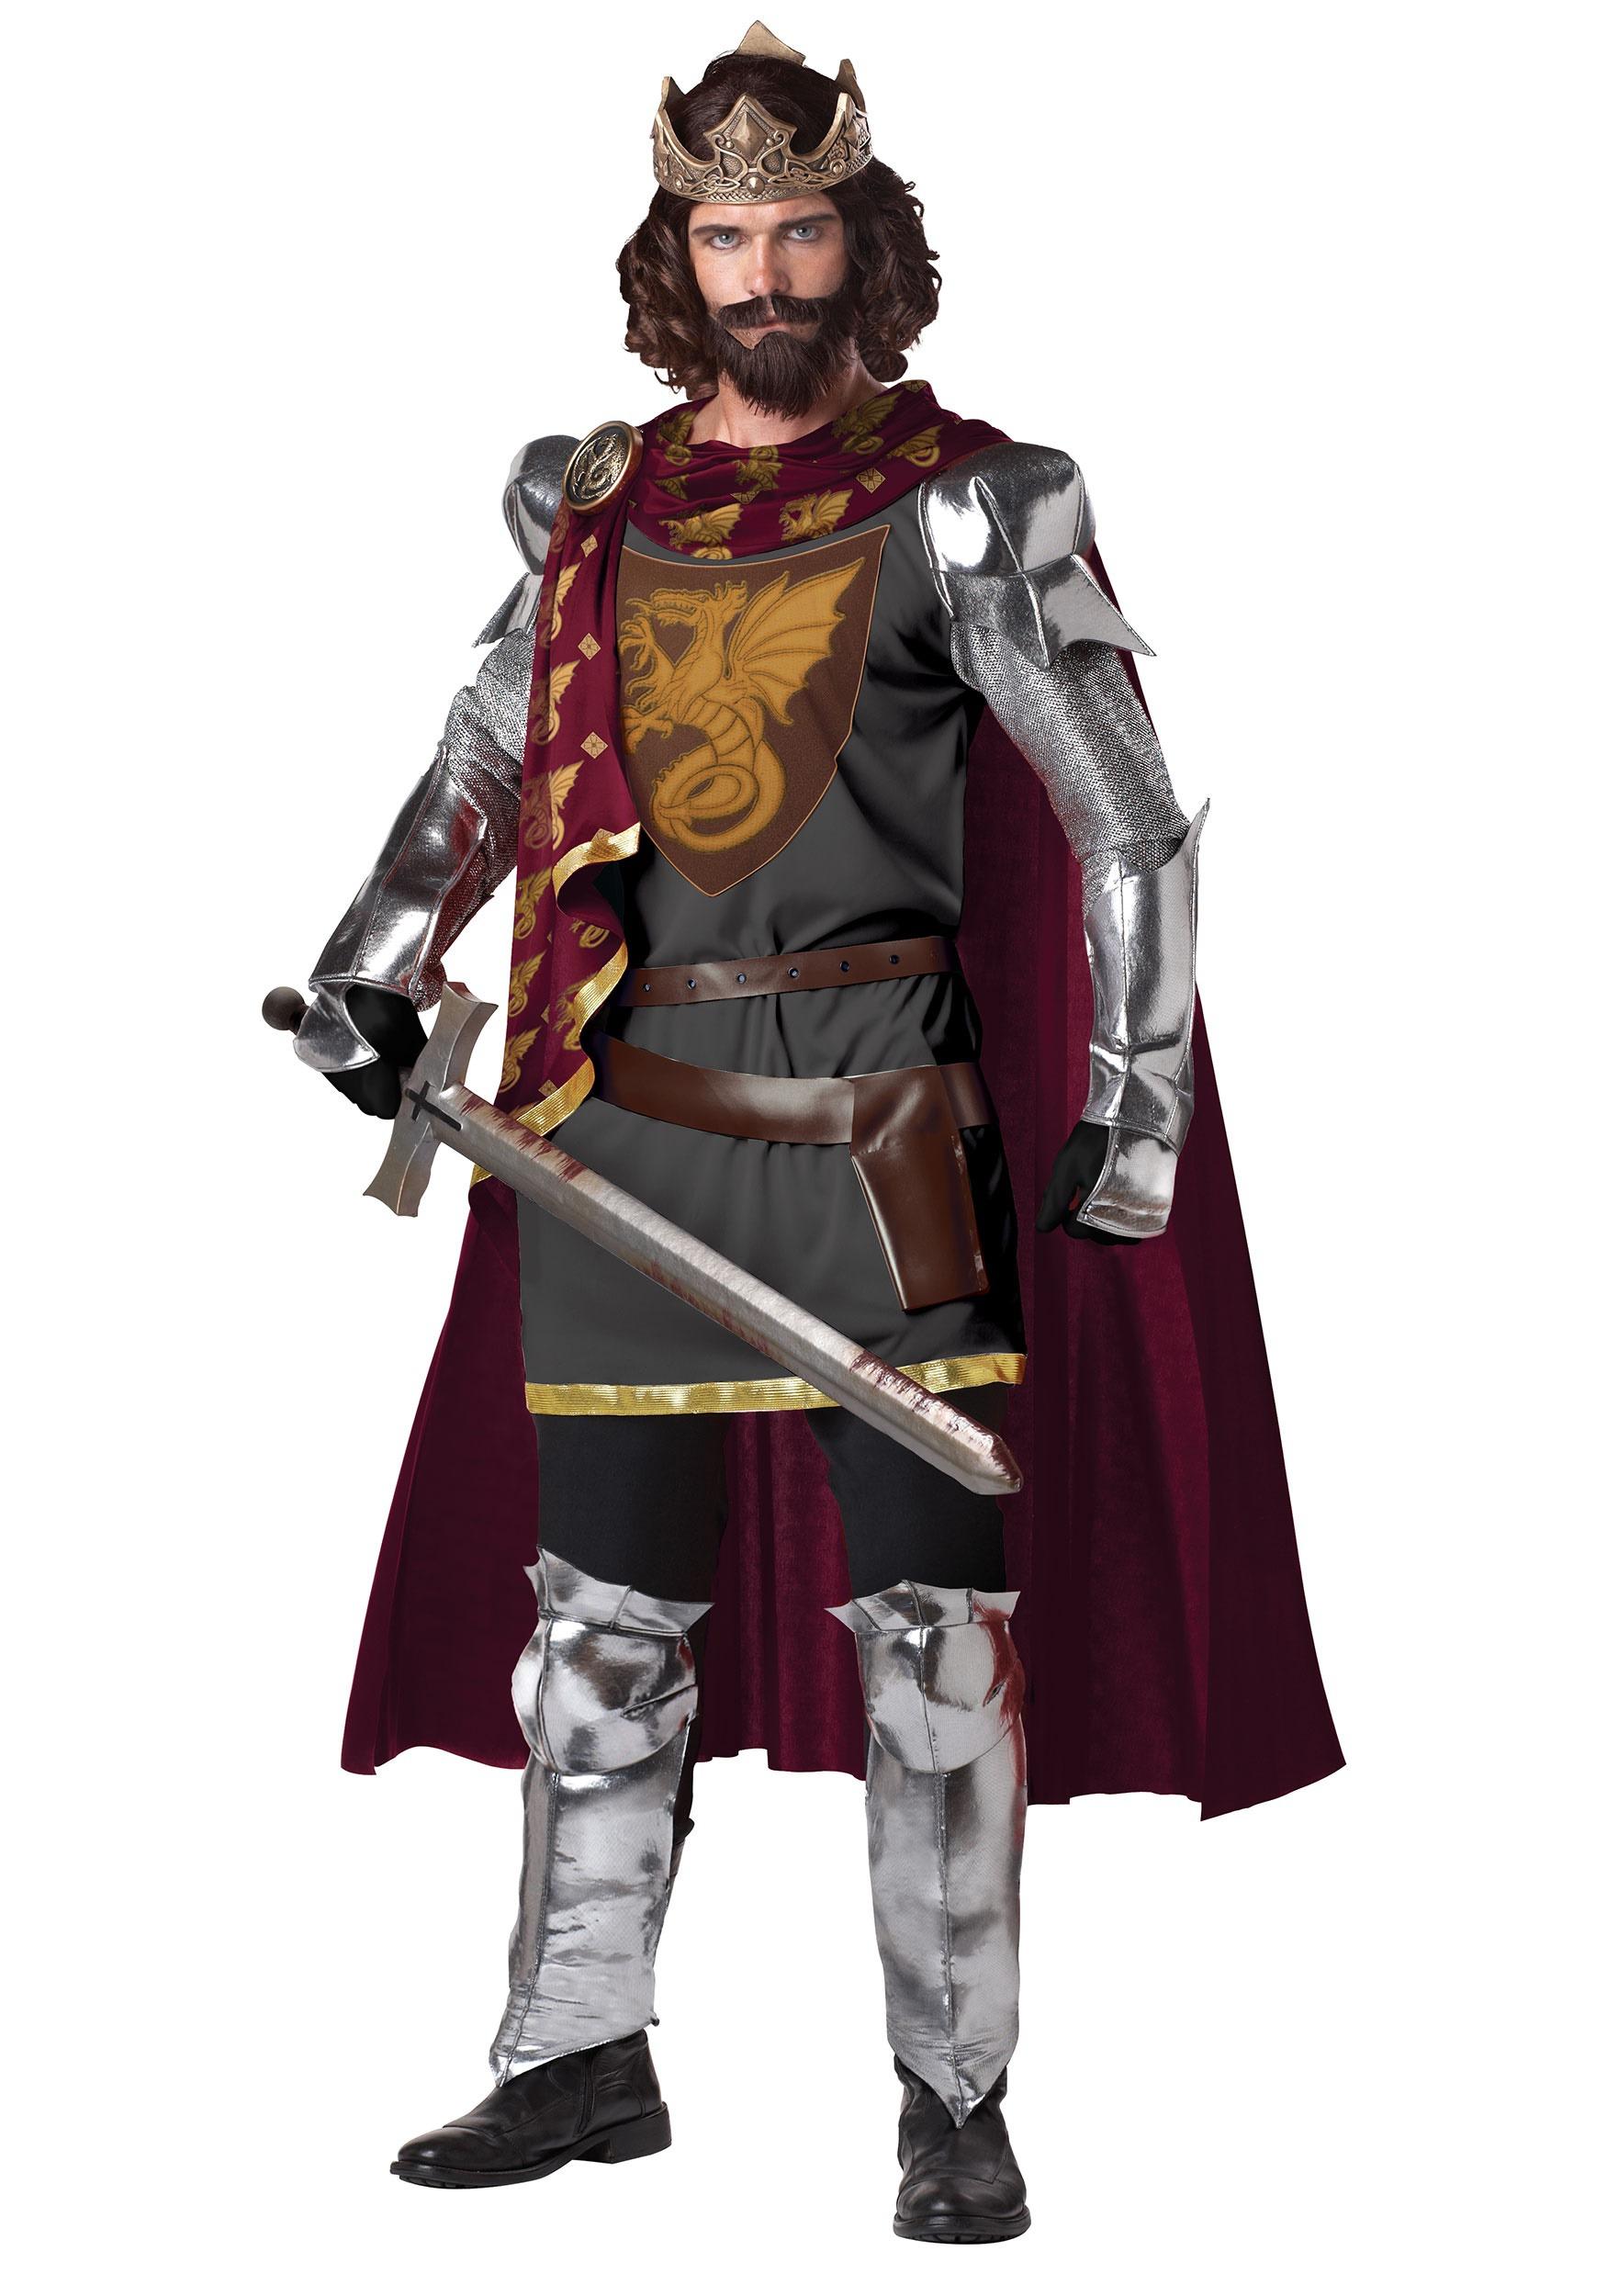 Adult King Costume 15